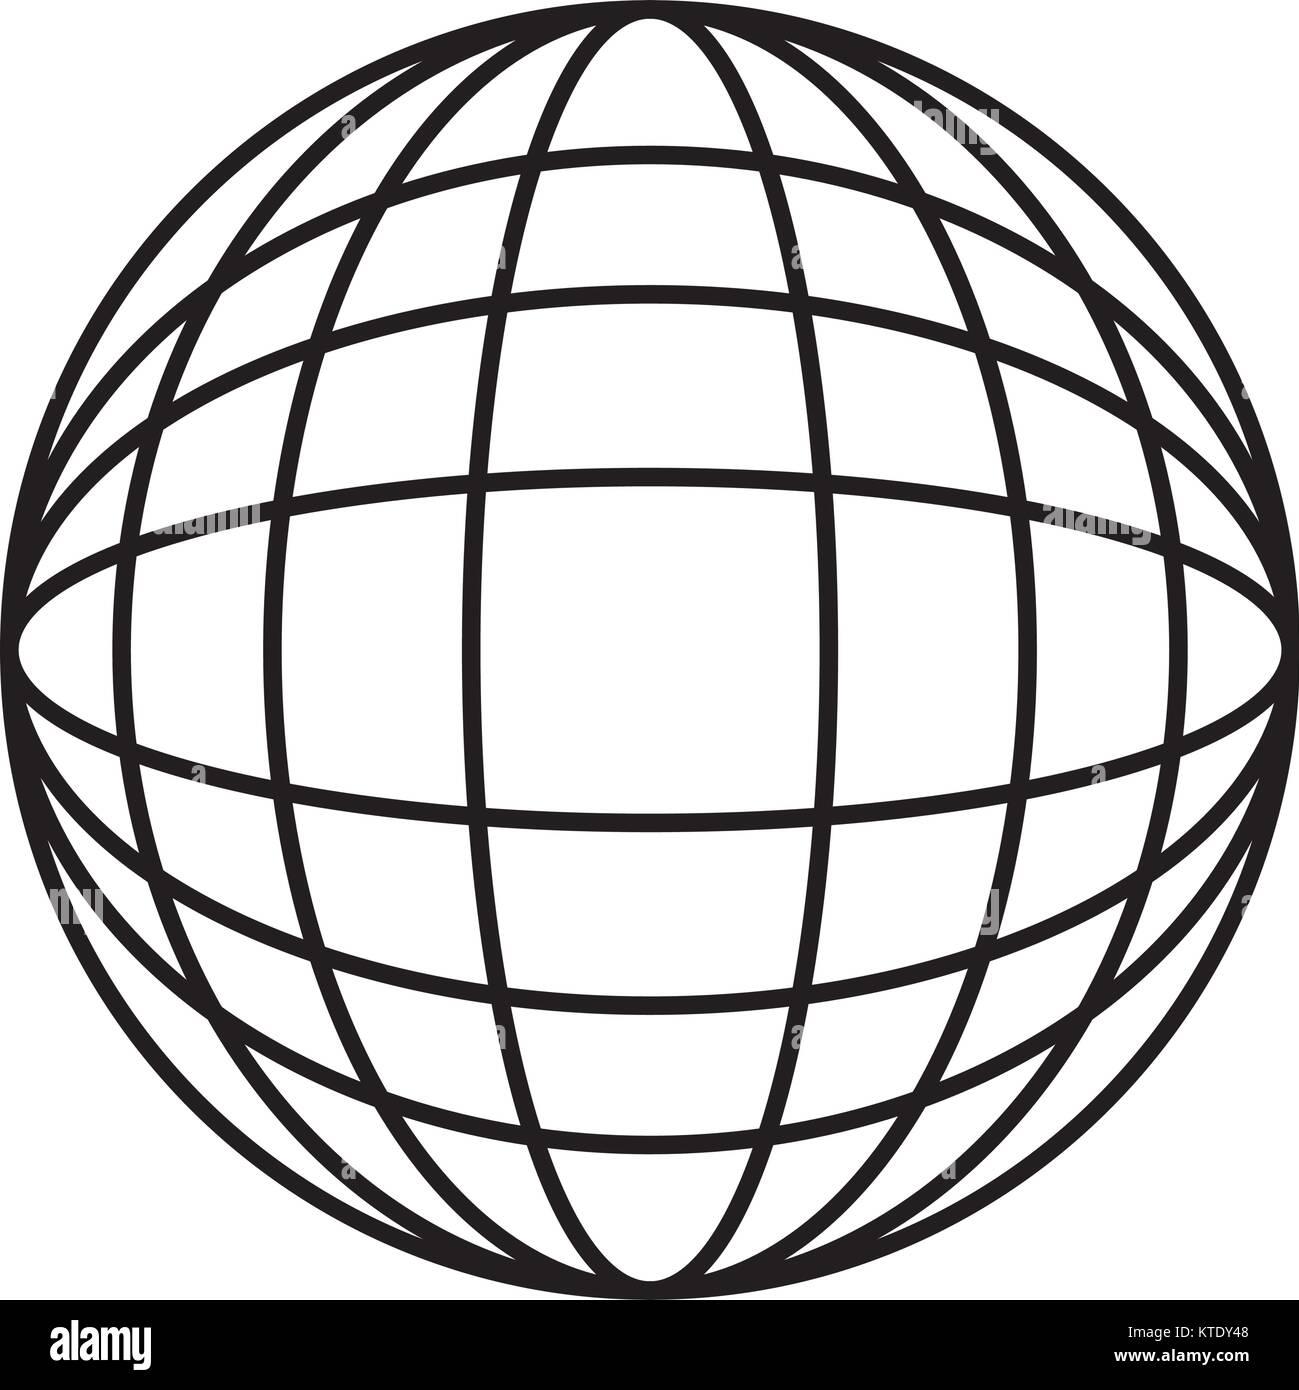 hight resolution of earth globe diagram icon image vector illustration design